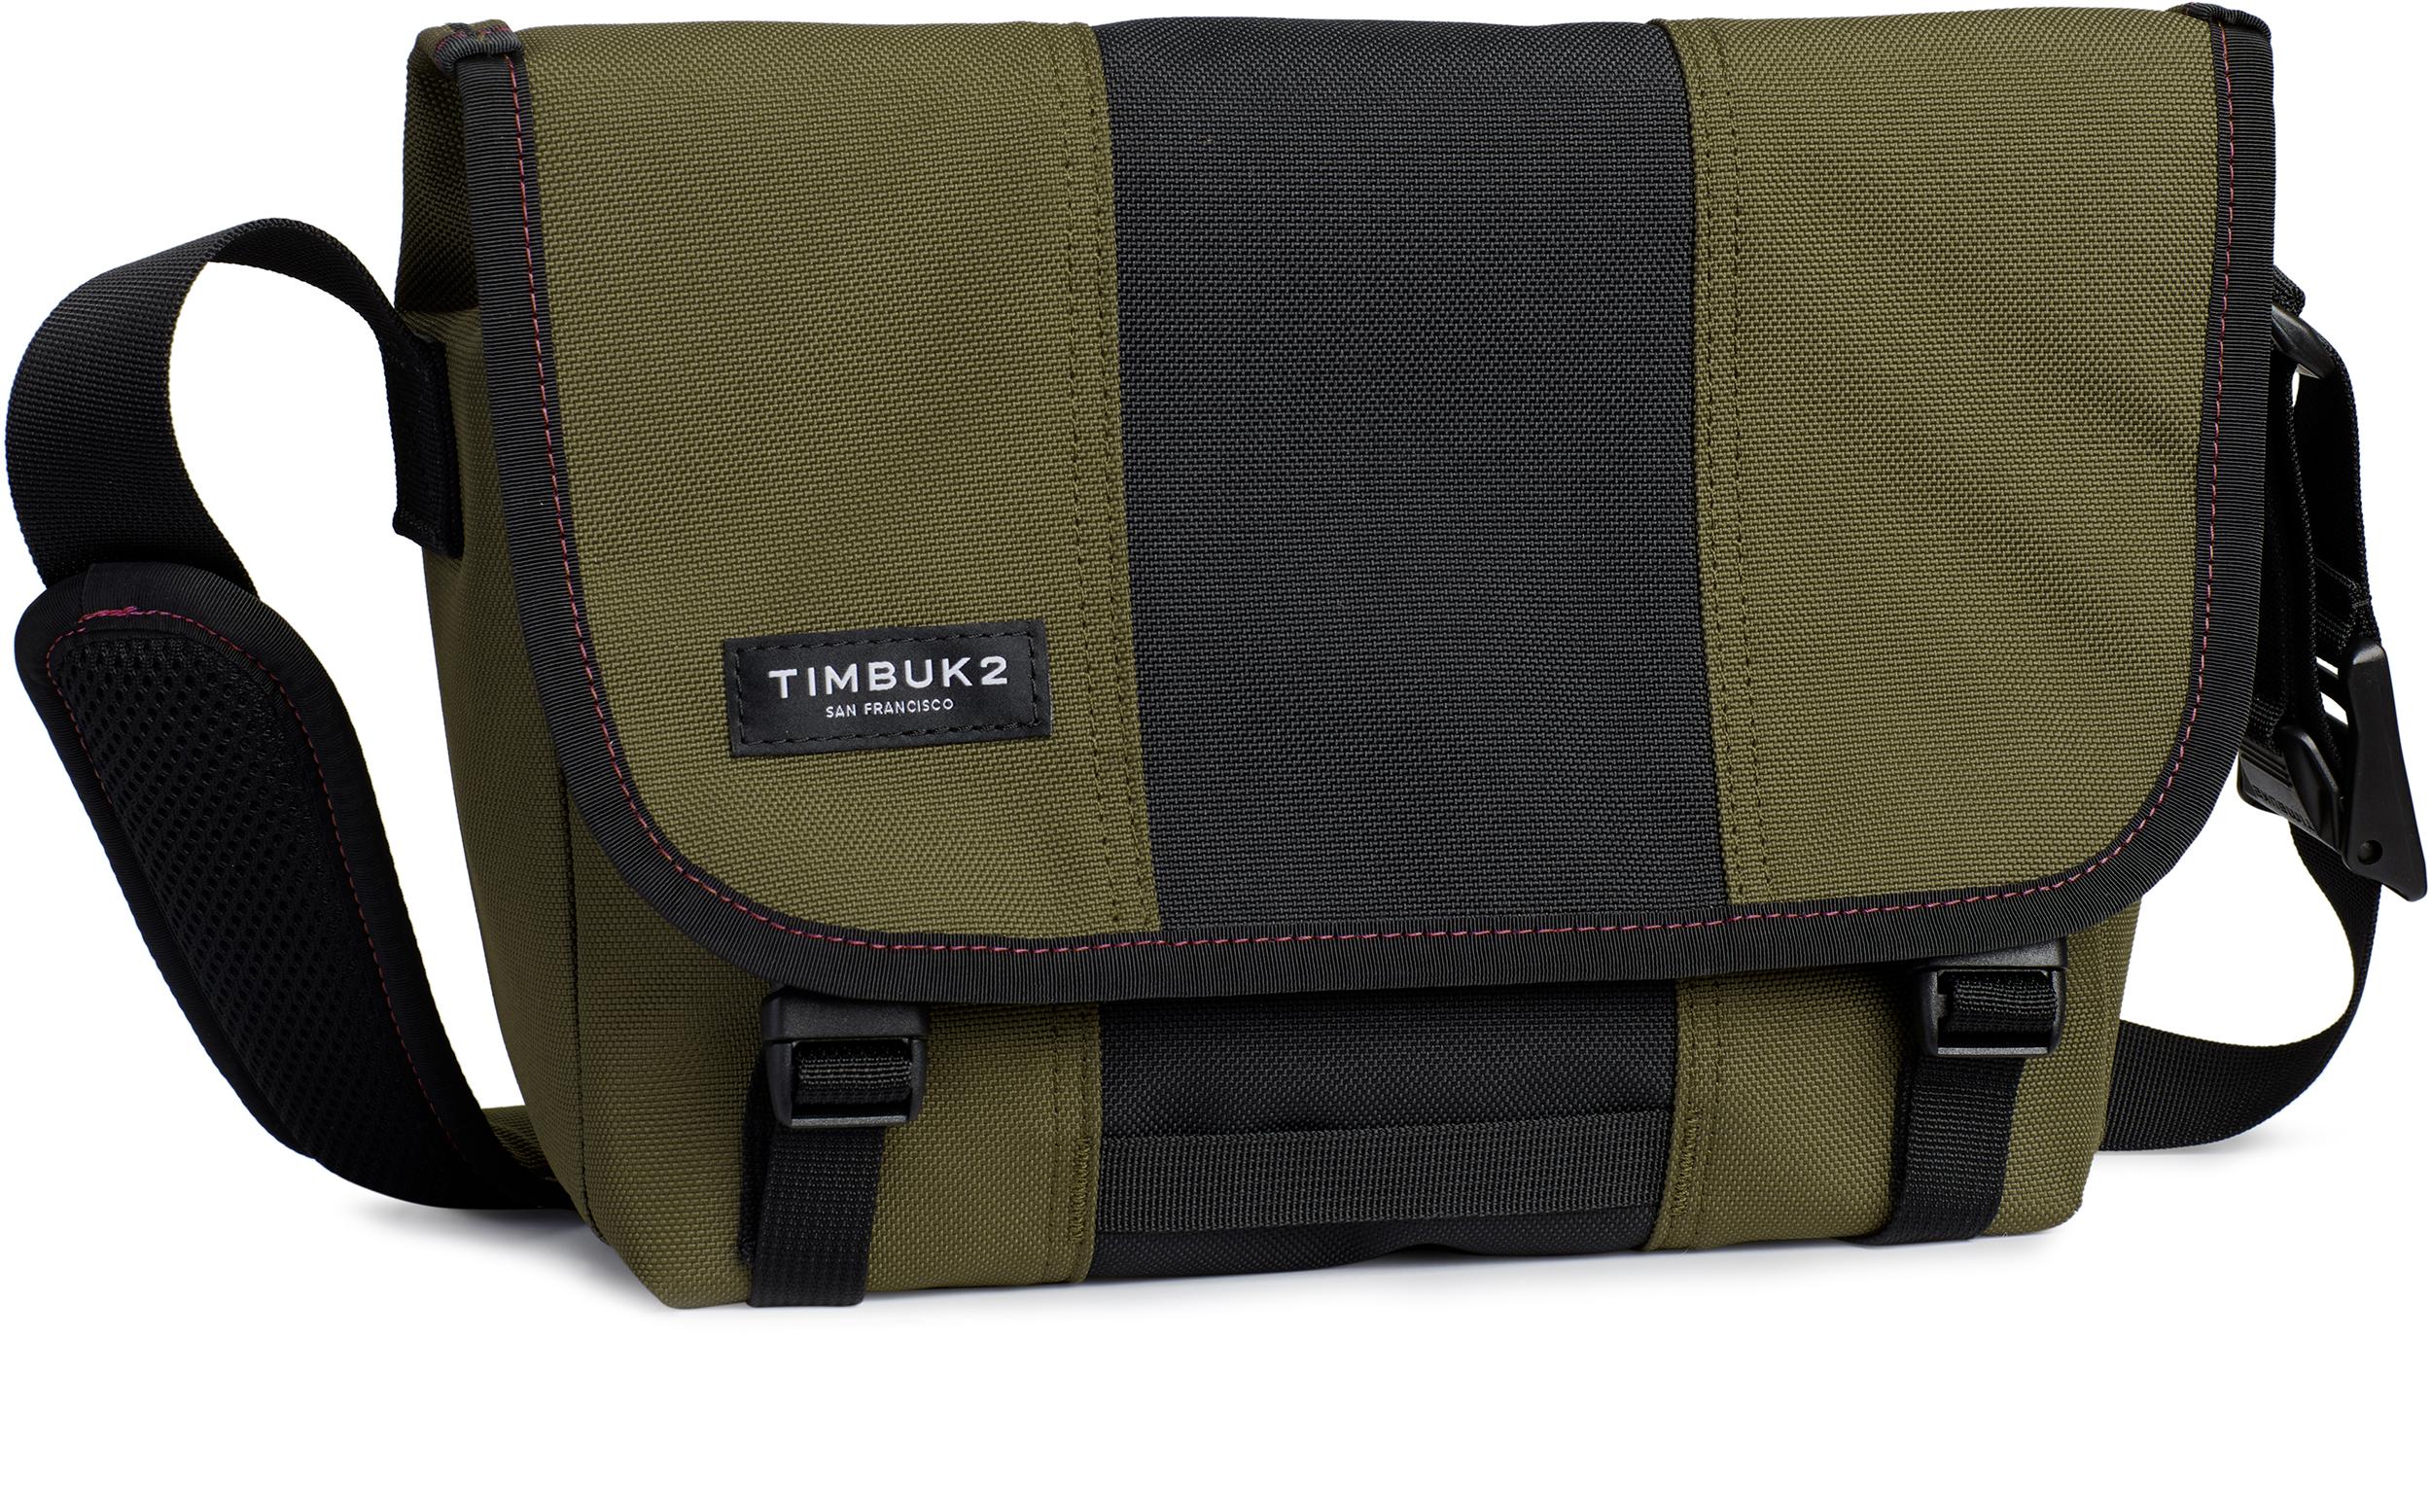 Timbuk2 Classic Messenger Bag - Unisex 0ac256635b